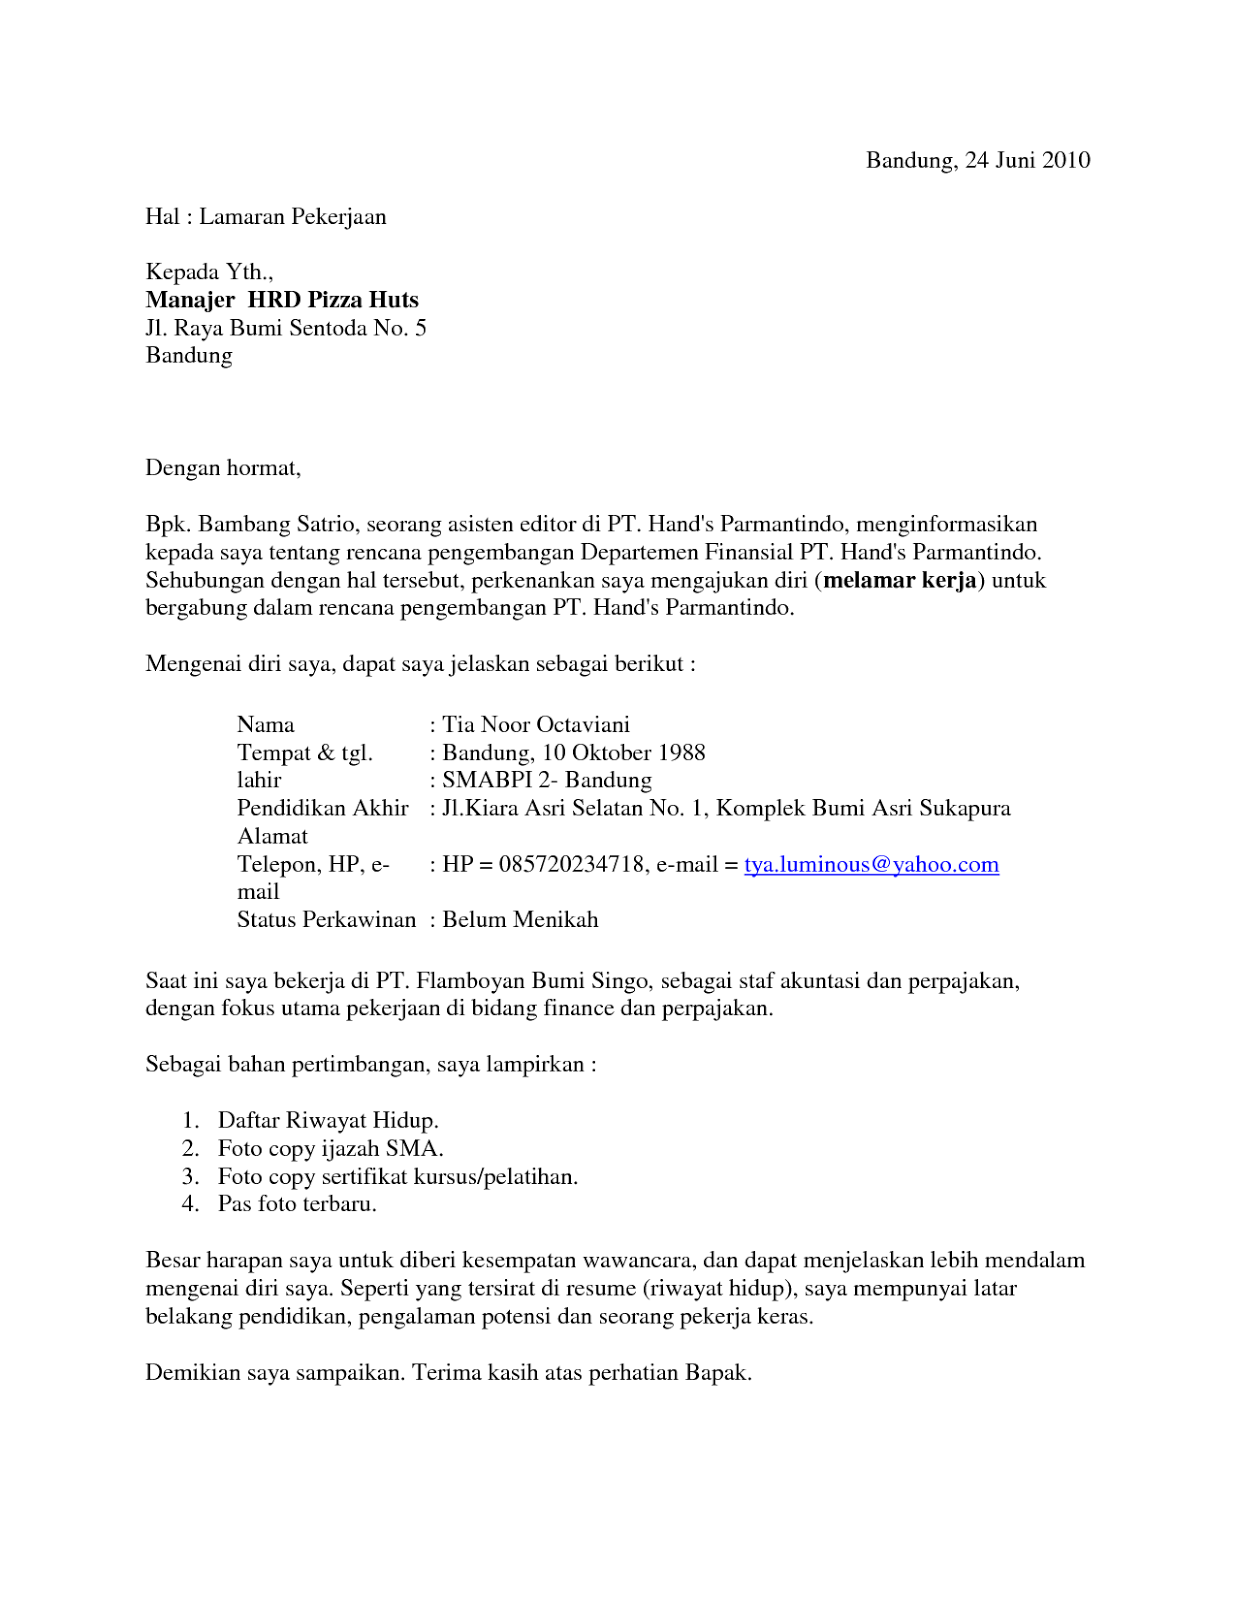 Contoh Surat Lamaran Kerja Penyiar Radio Dalam Bahasa Inggris